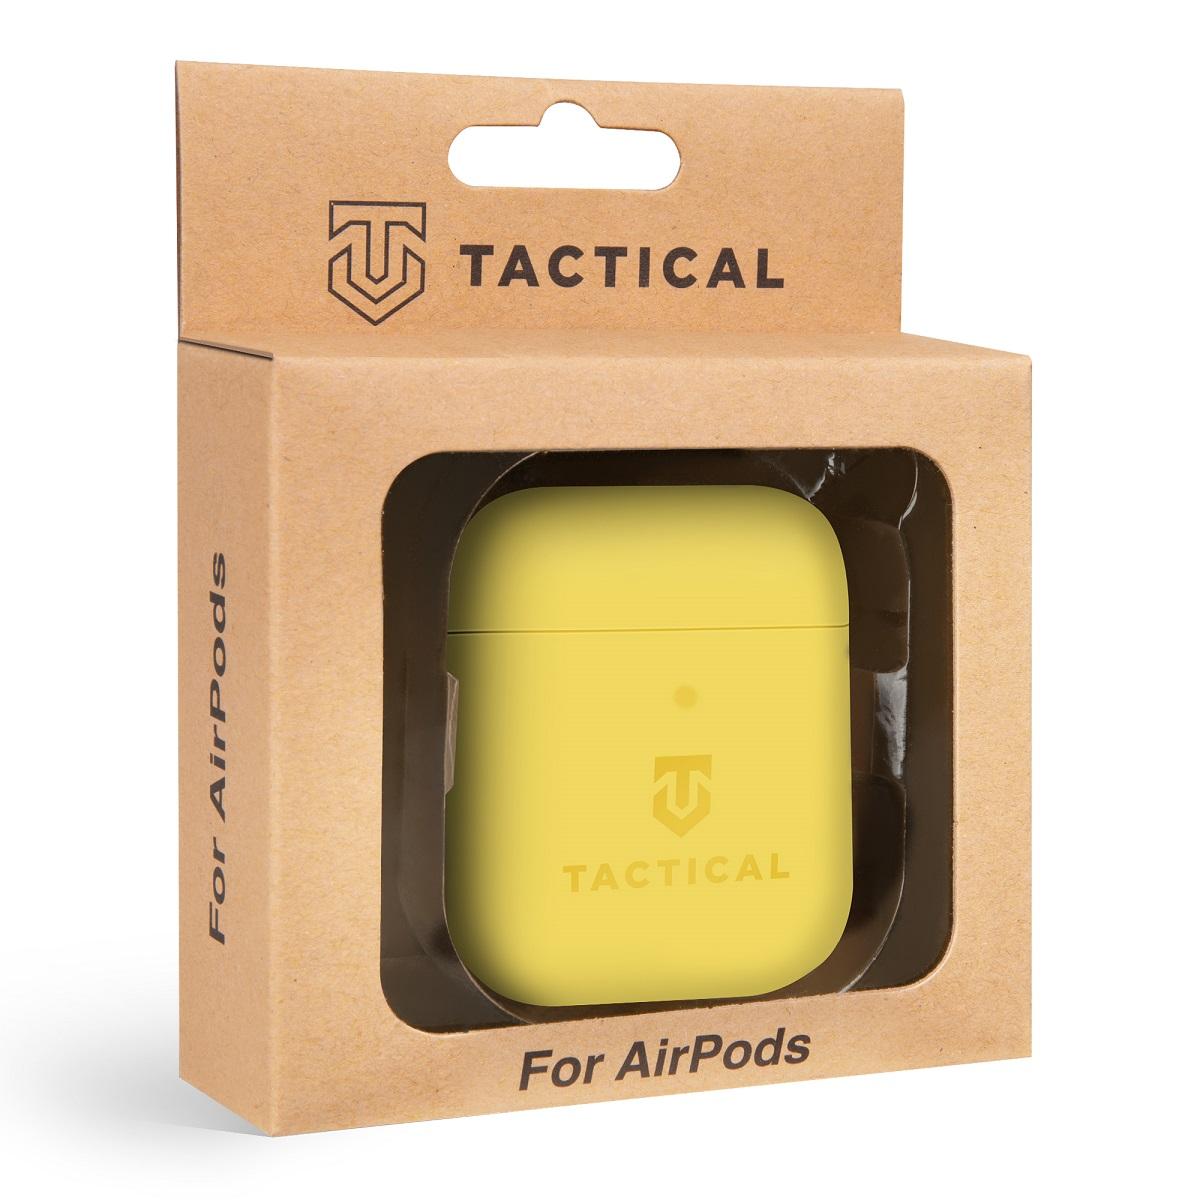 Tactical Velvet Smoothie silikonové pouzdro, obal, kryt Apple AirPods banana